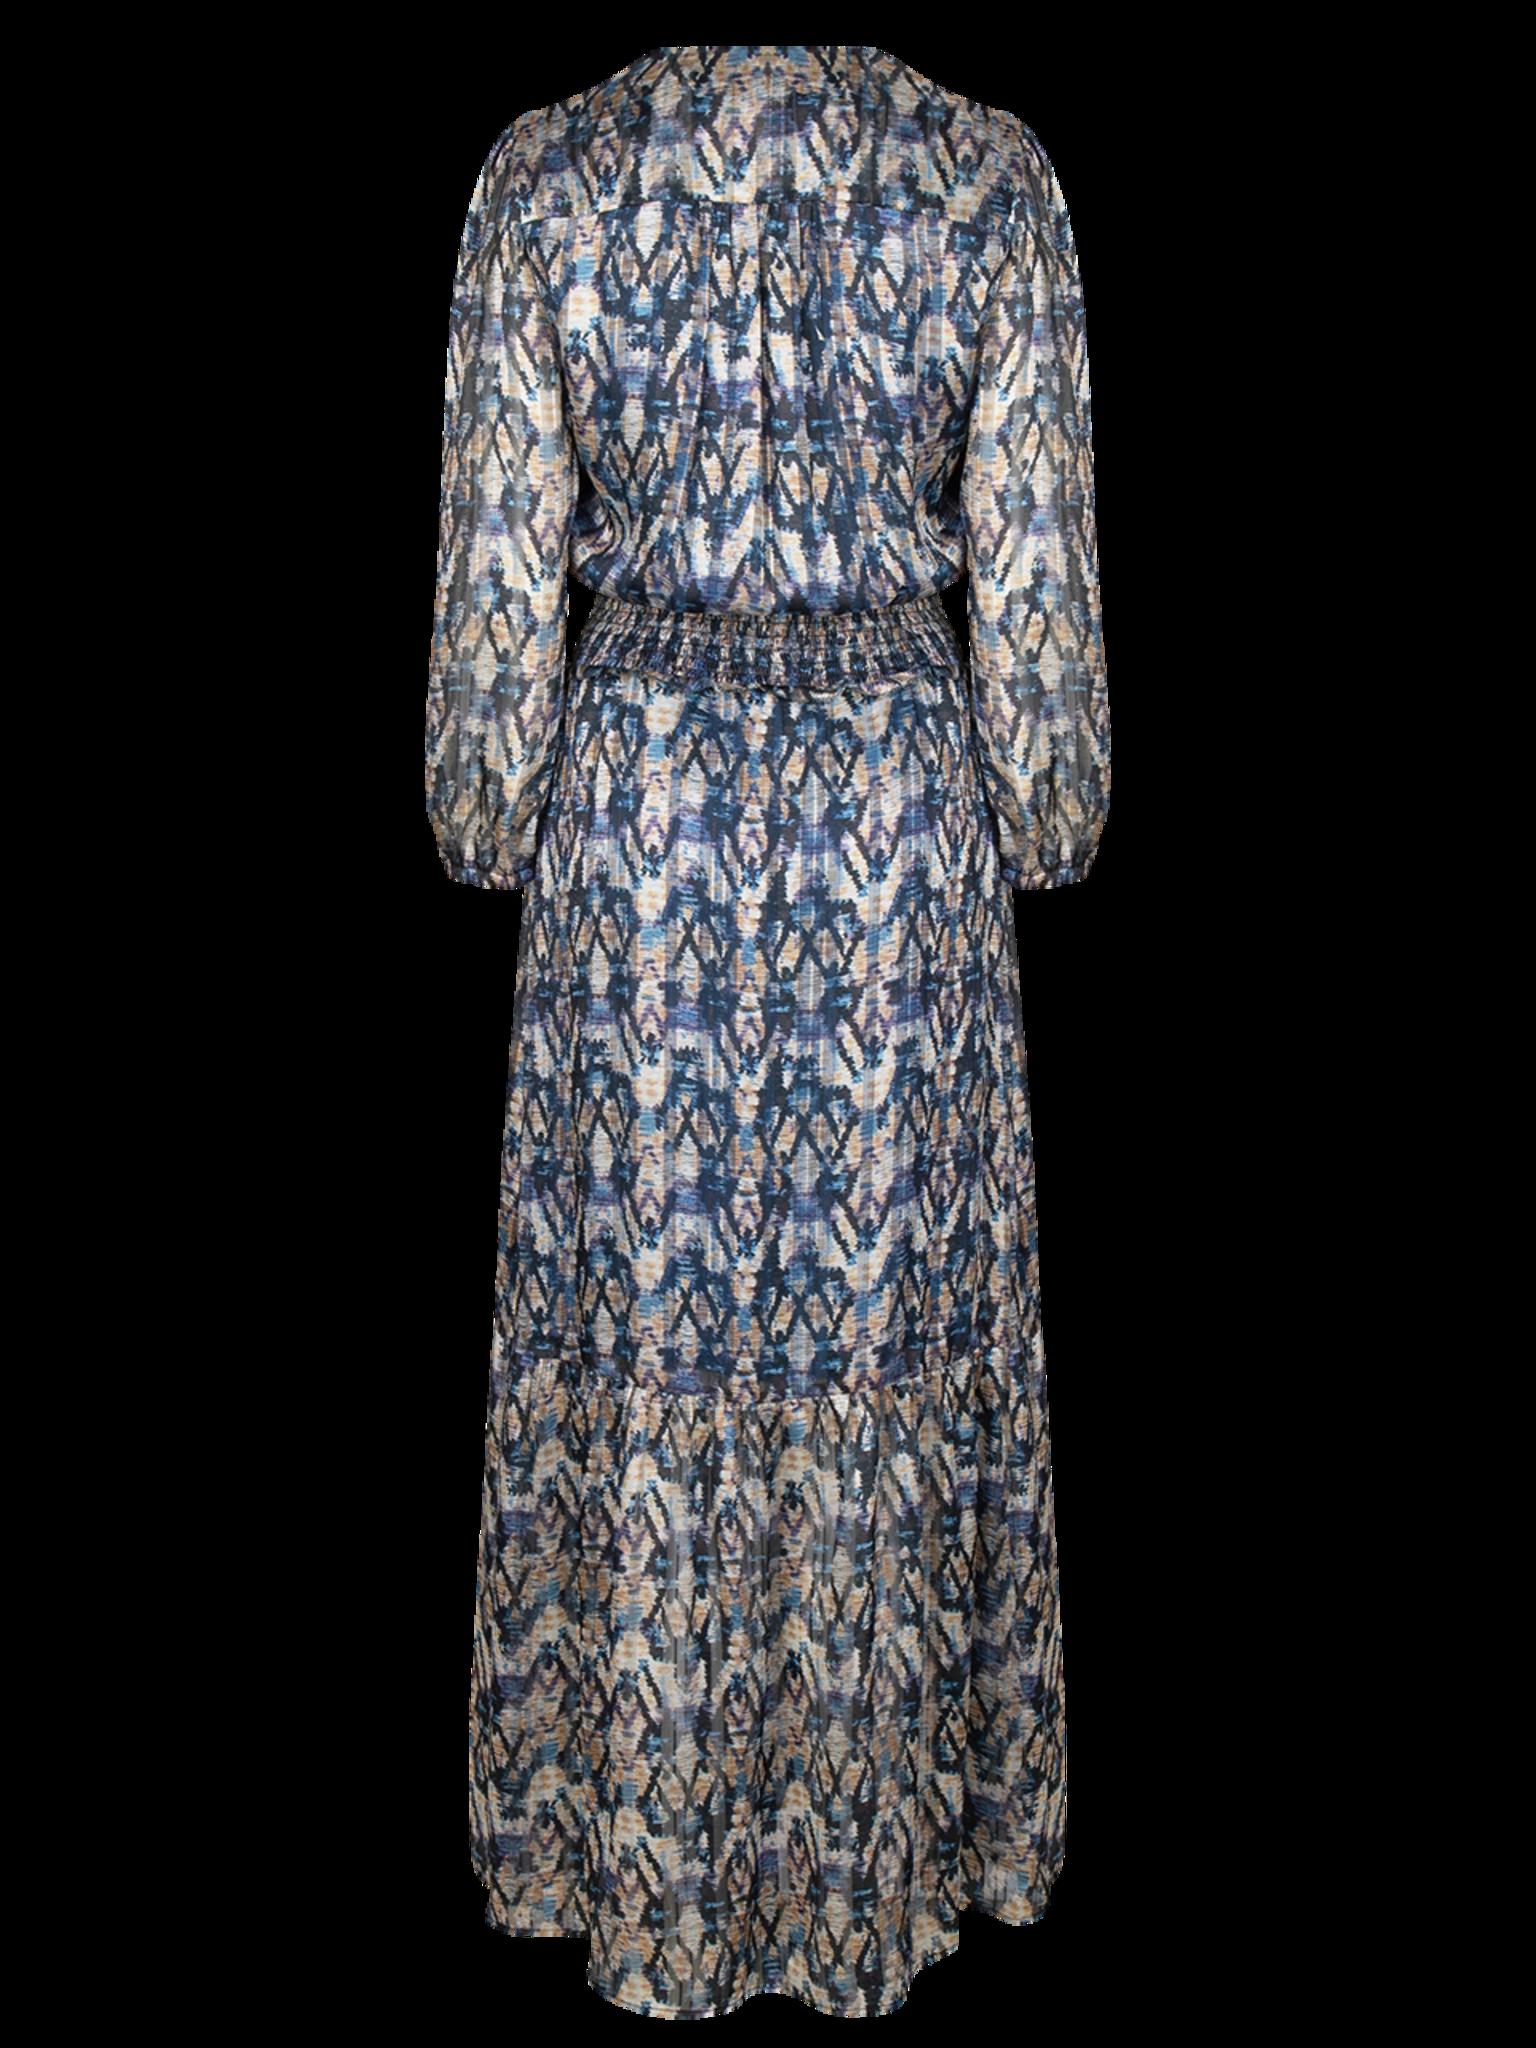 Dante 6 Dress 211141 BARDON-2